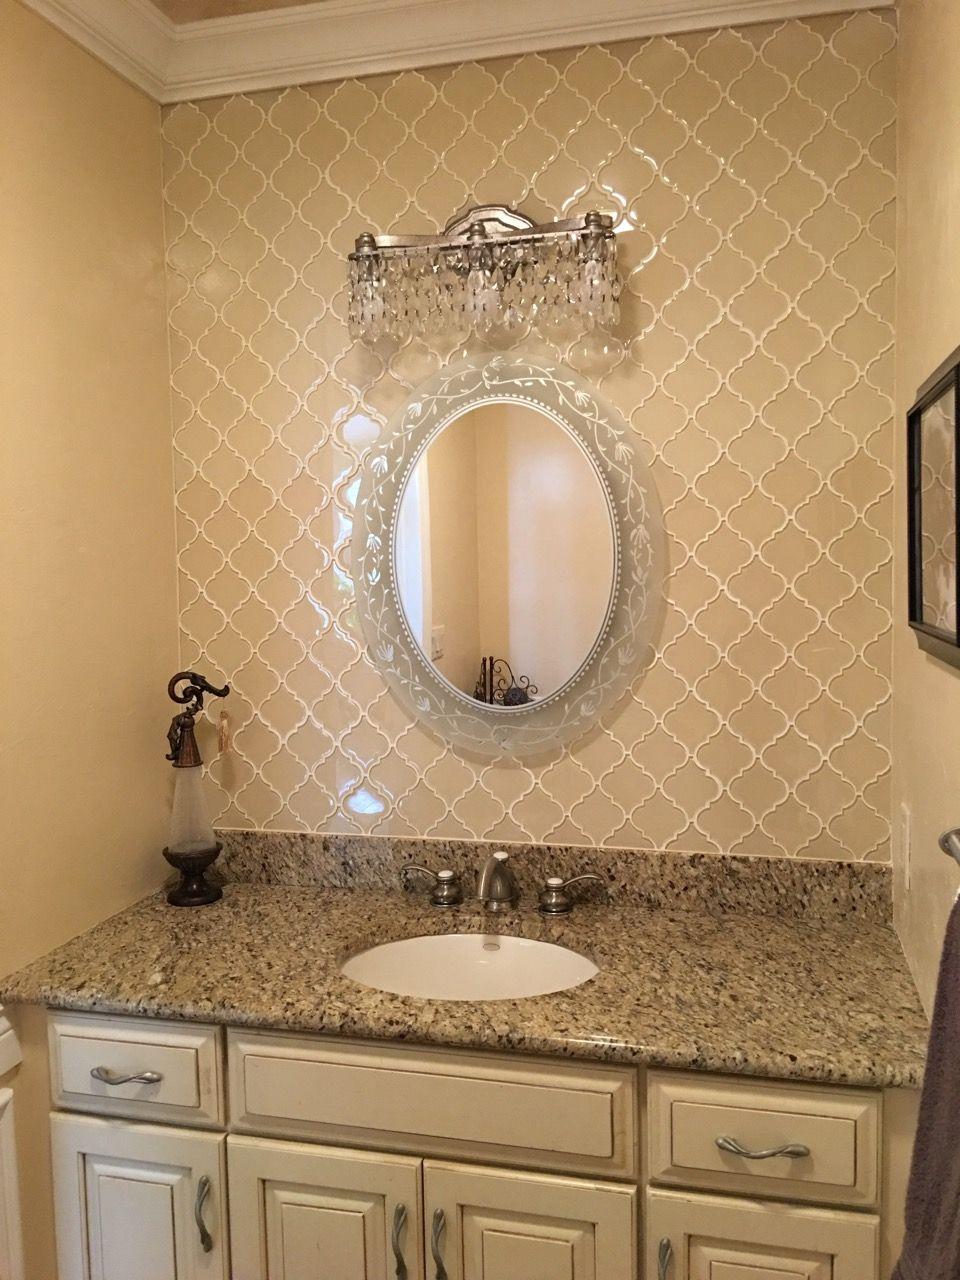 Gorgeous Vanity Backsplash Using Cream Arabesque Glass Tile Merges With The Timeless Elegance Of This Sp Glass Tile Bathroom Bathroom Backsplash Tile Bathroom